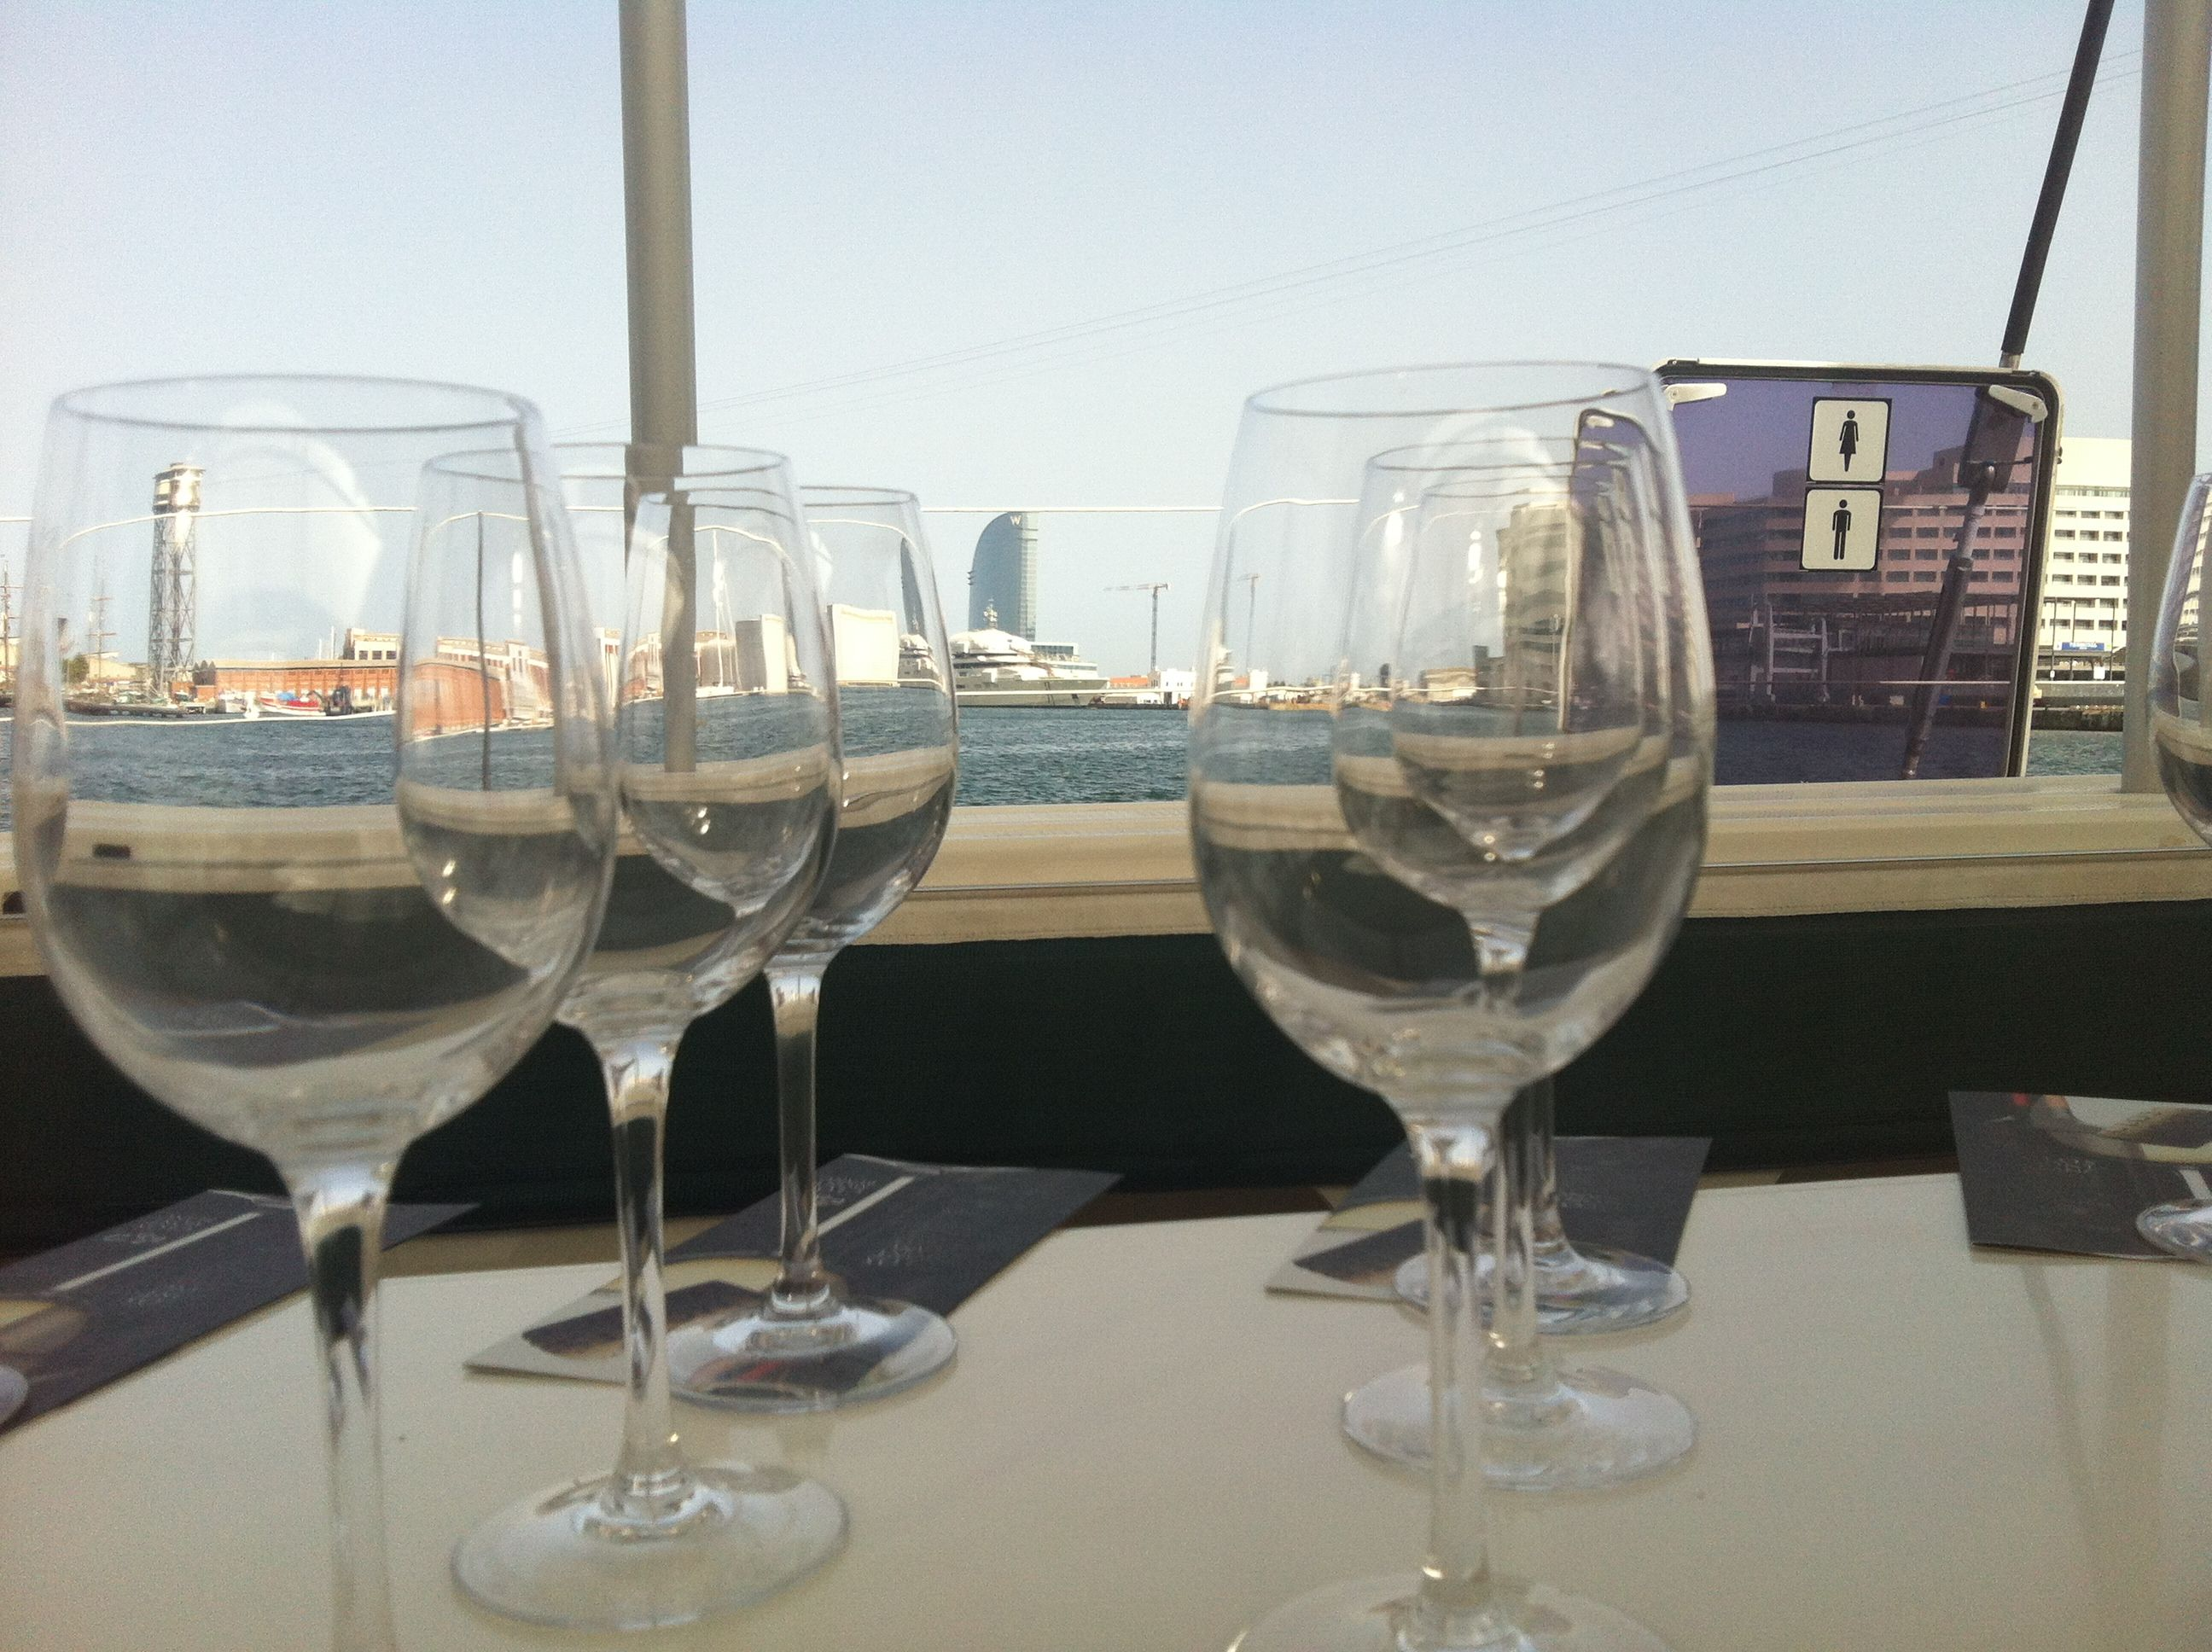 Cata de vino en catamaran.